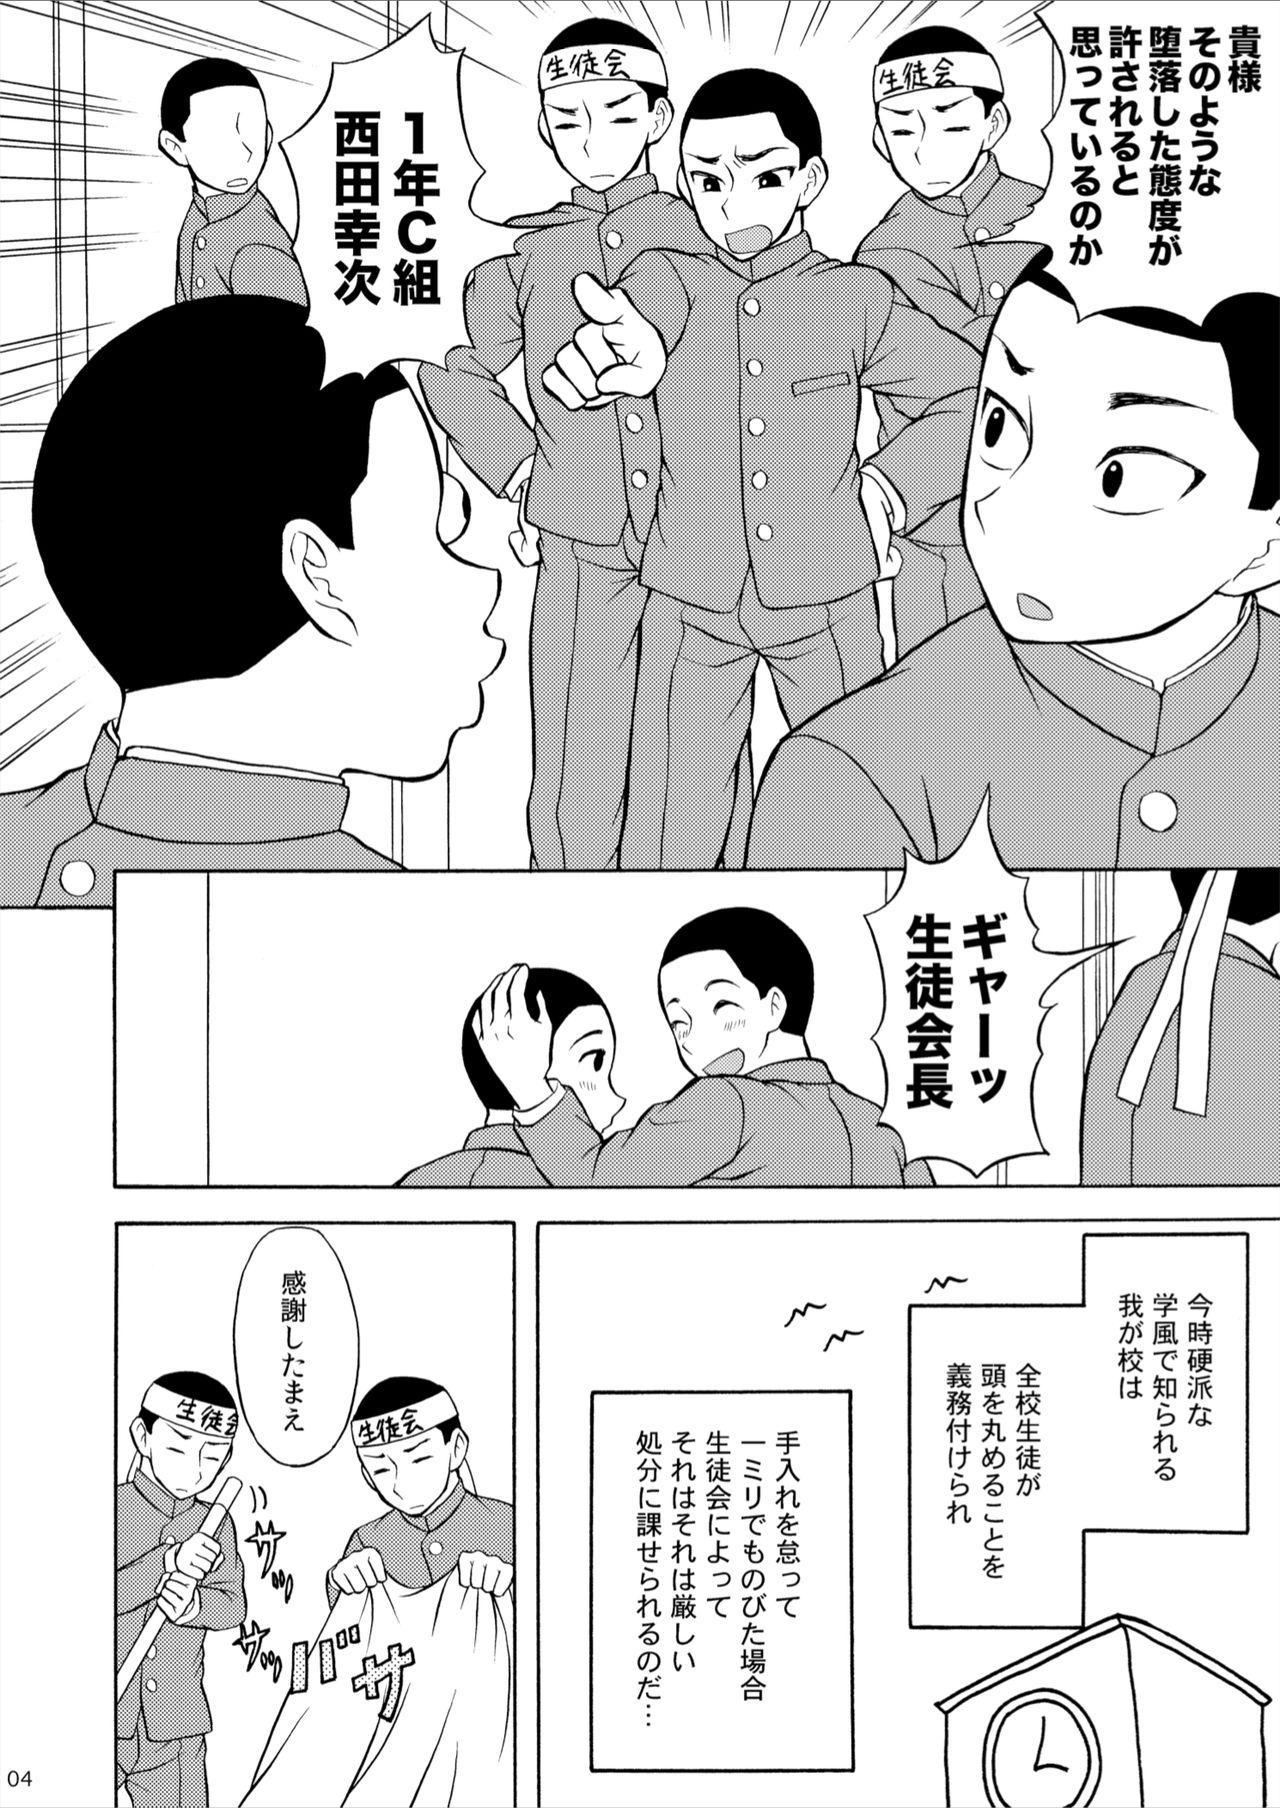 Marugari Jigokuhen 3